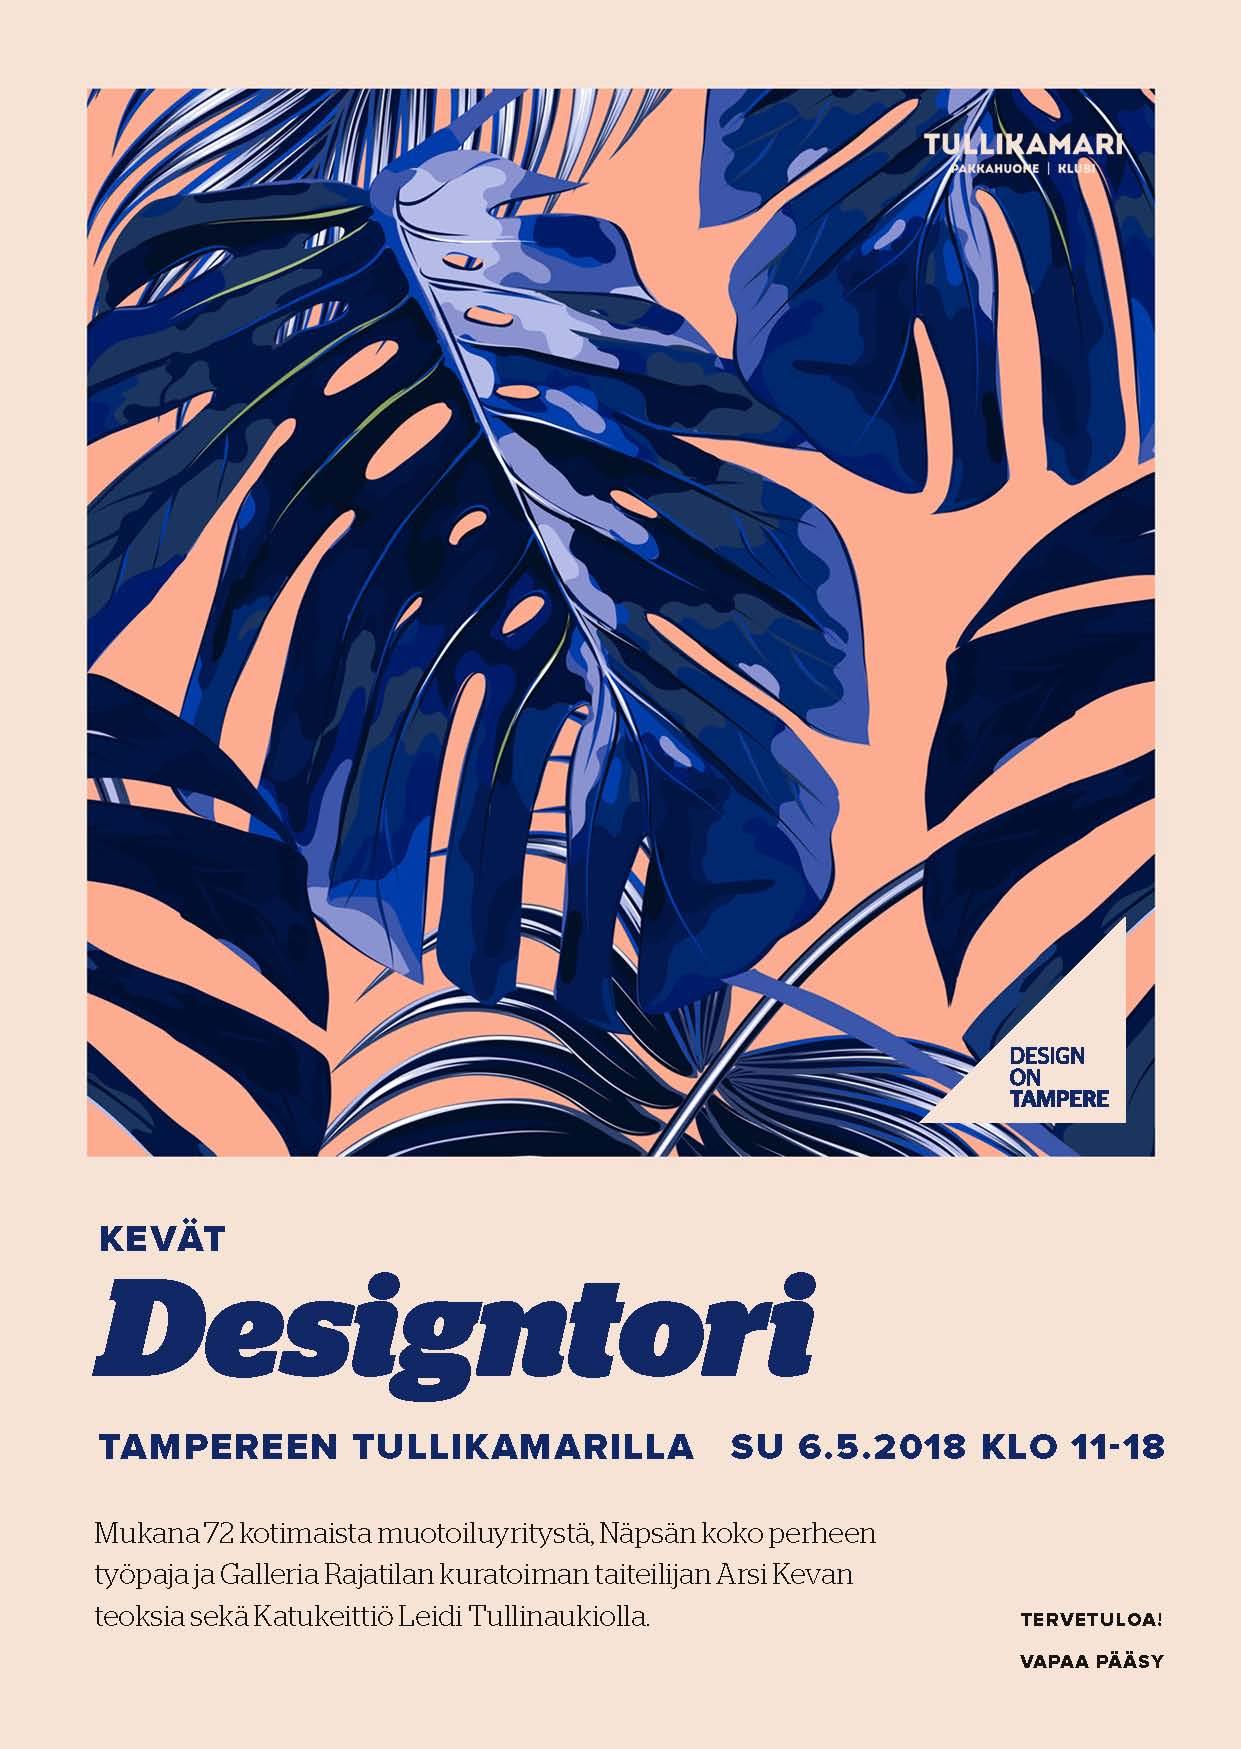 Designtori kevät Tampere 2018